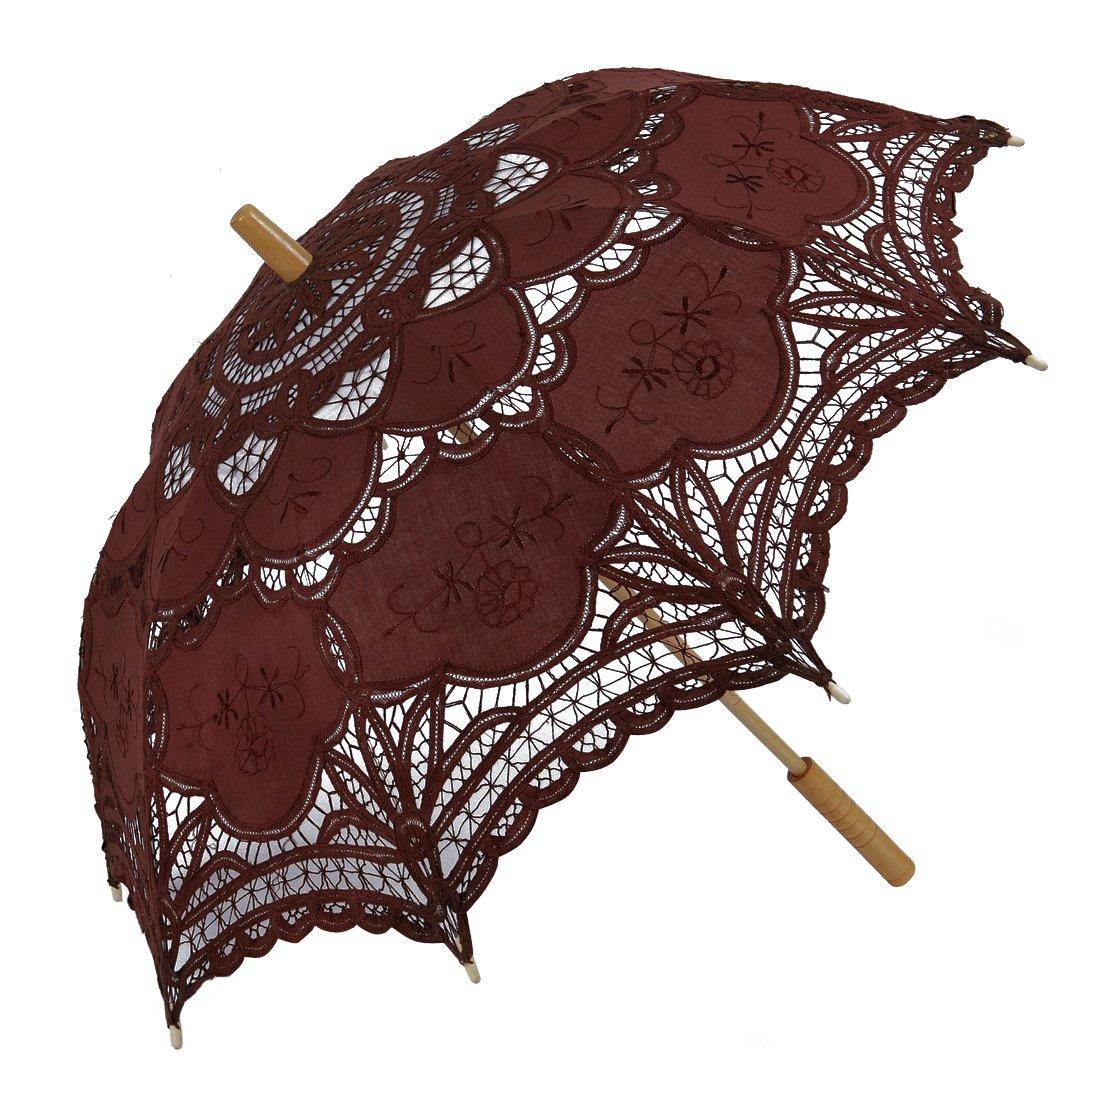 Topwedding Handmade Embroidery Pure Cotton Lace Wedding Parasol Umbrella, Brown